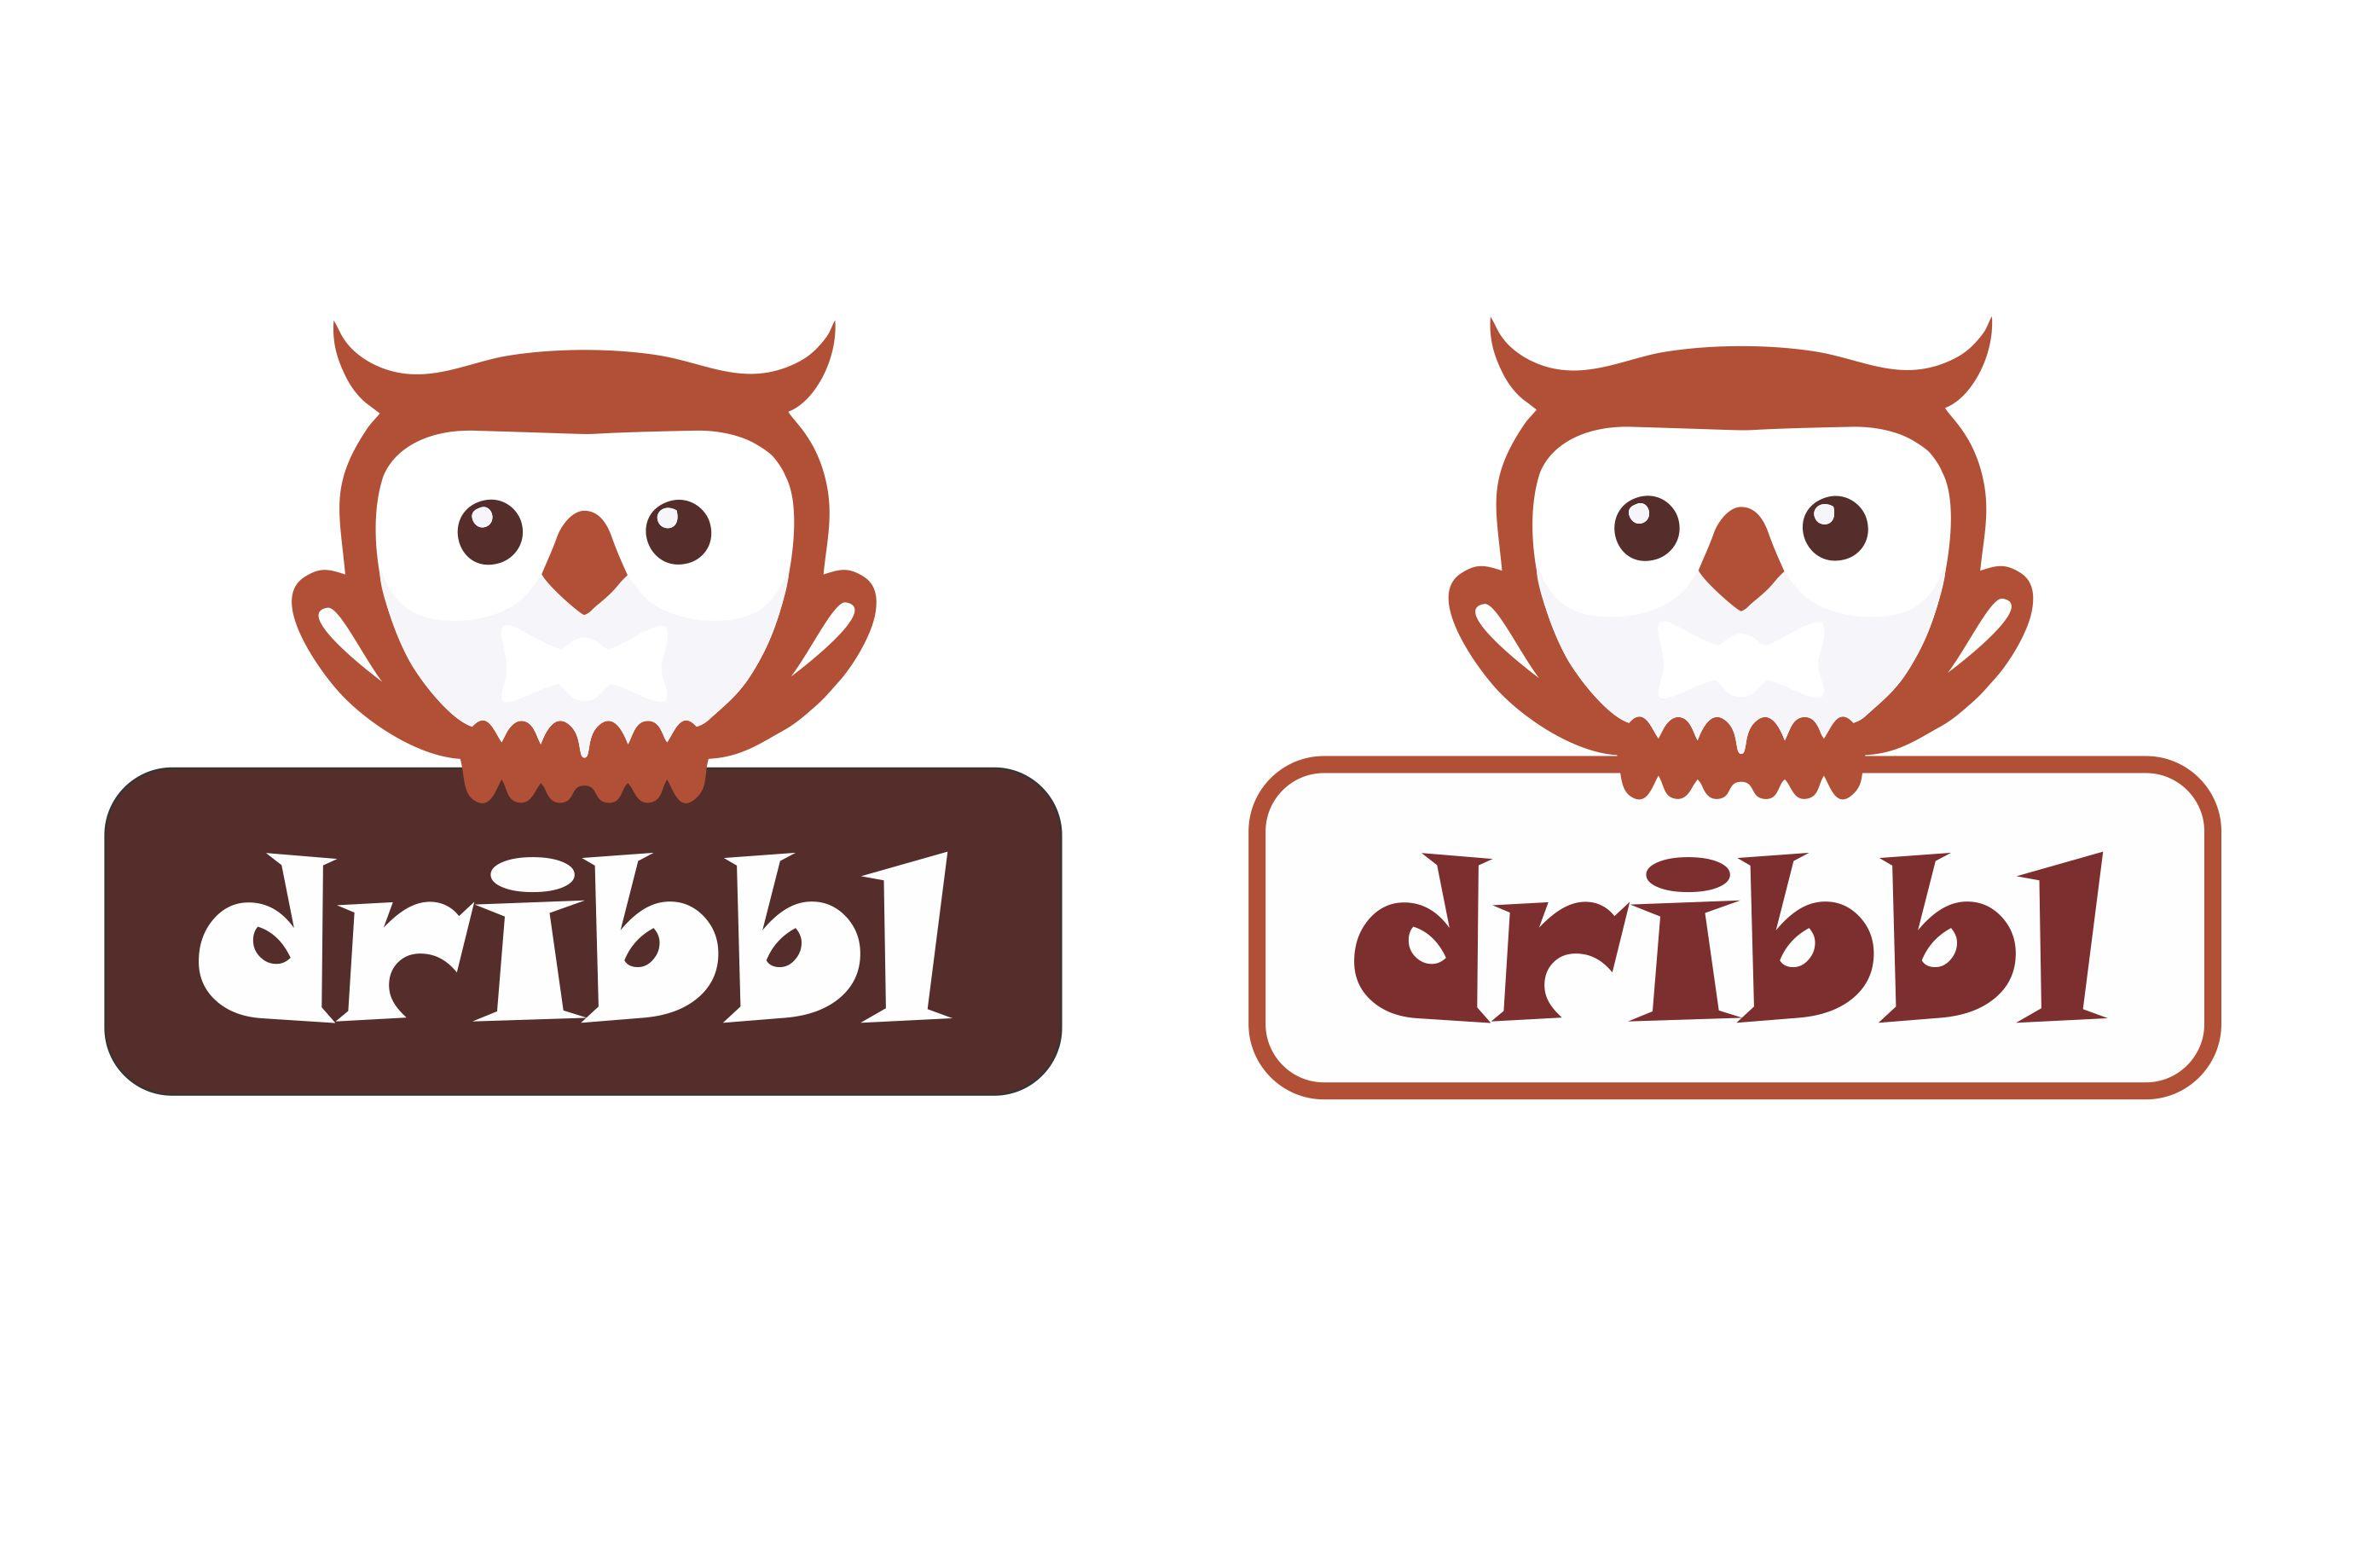 Разработка логотипа для сайта Dribbl.ru фото f_3865a9c34dceab9f.jpg